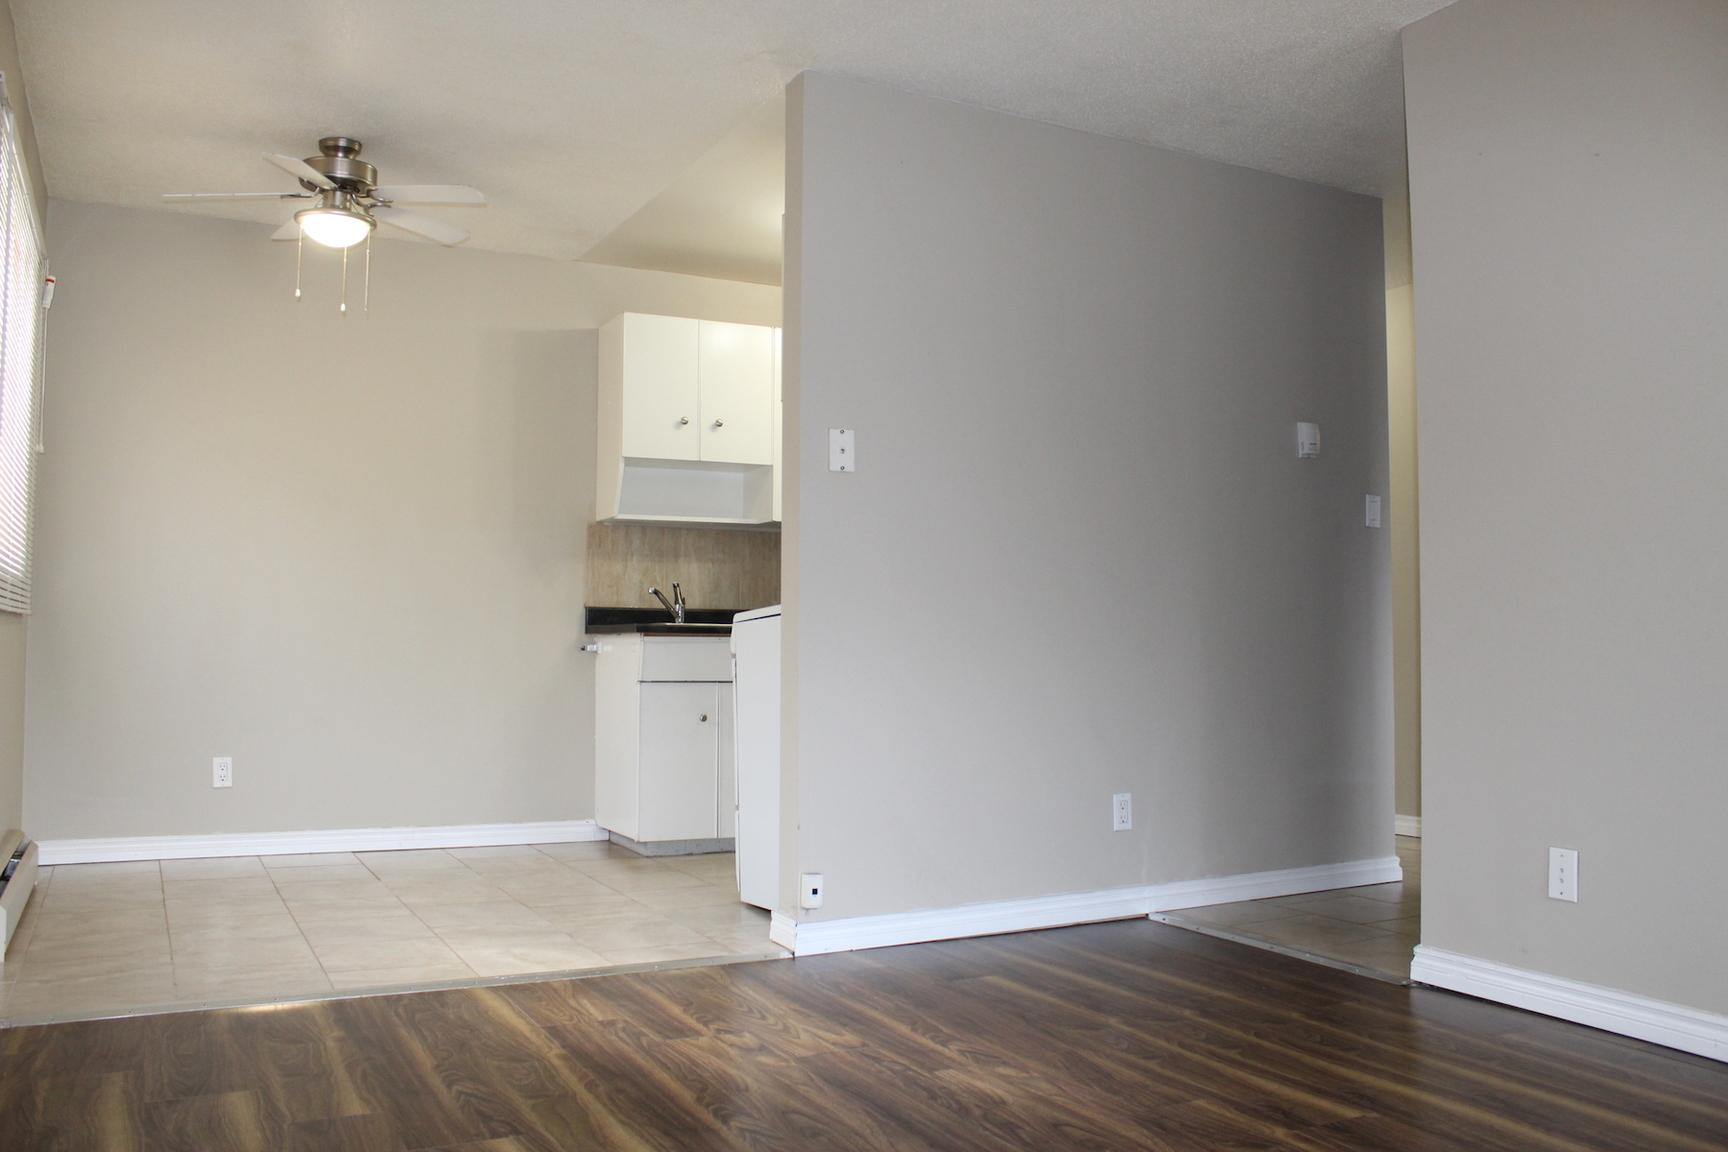 15216 100 Avenue NW, Edmonton, AB - $825